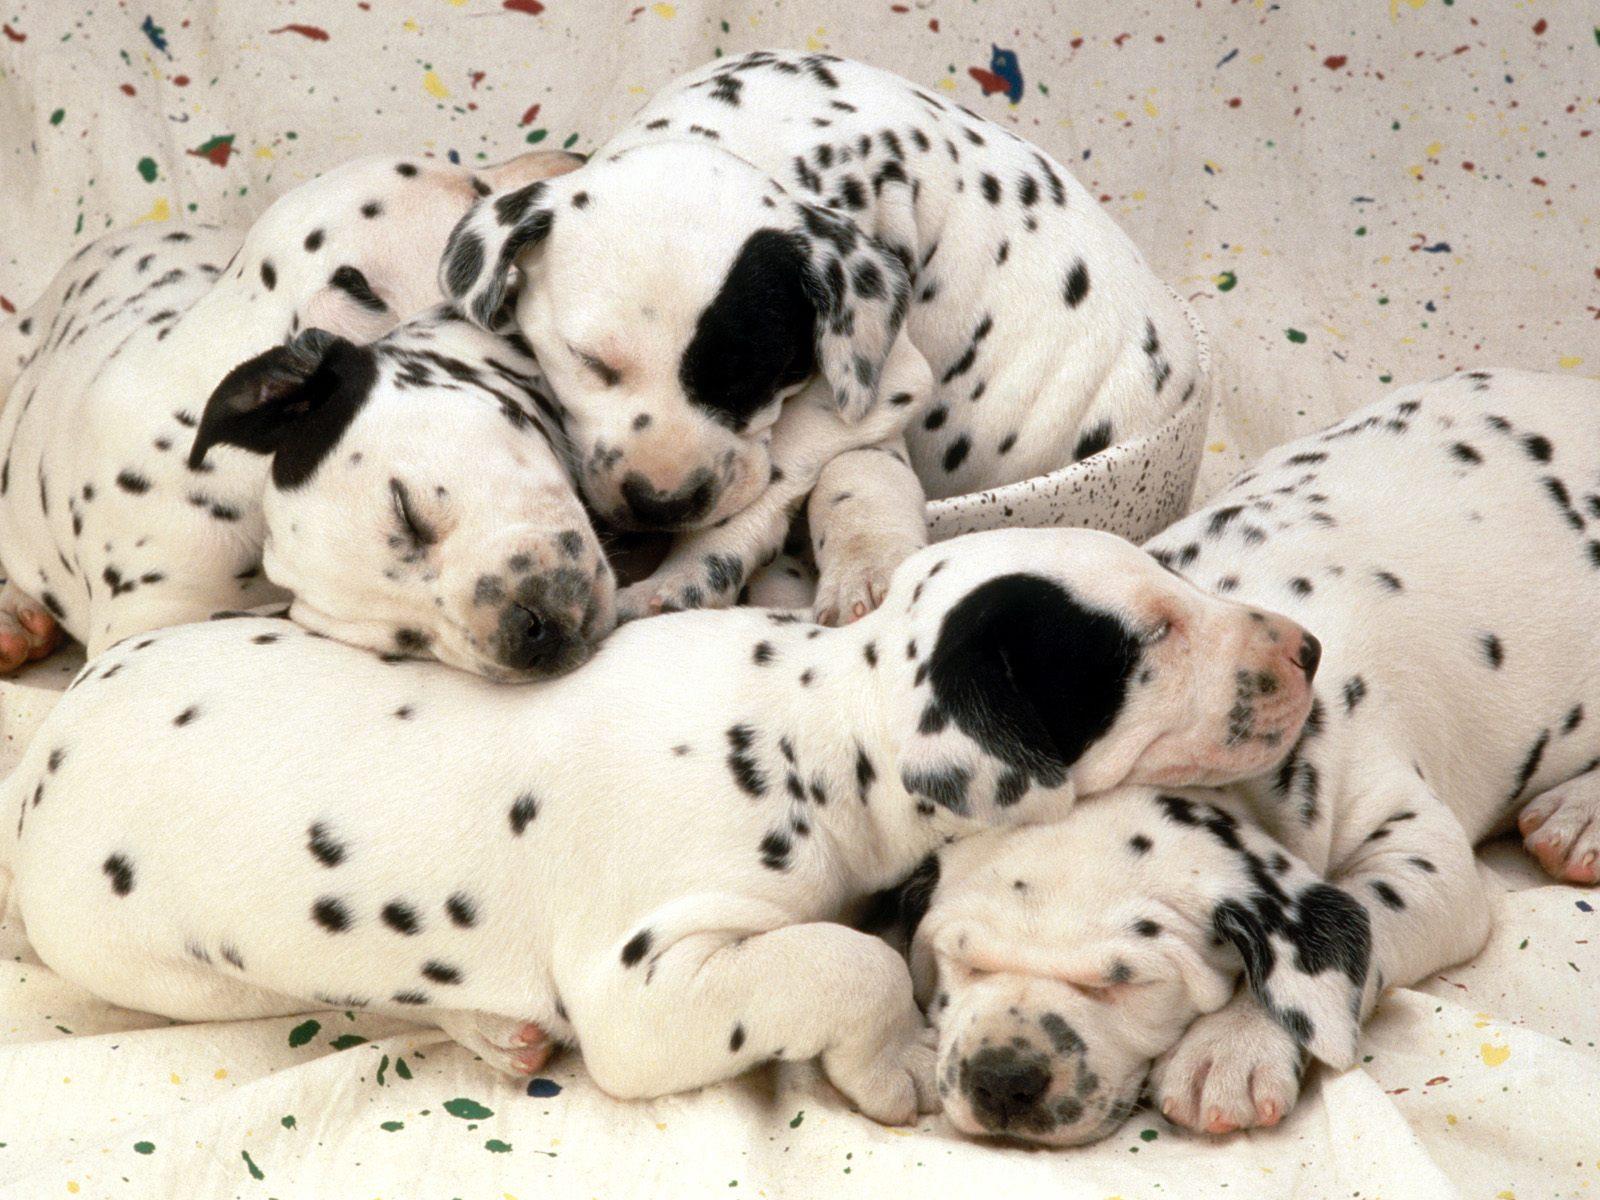 Sleeping Dalmatian Puppies Photo